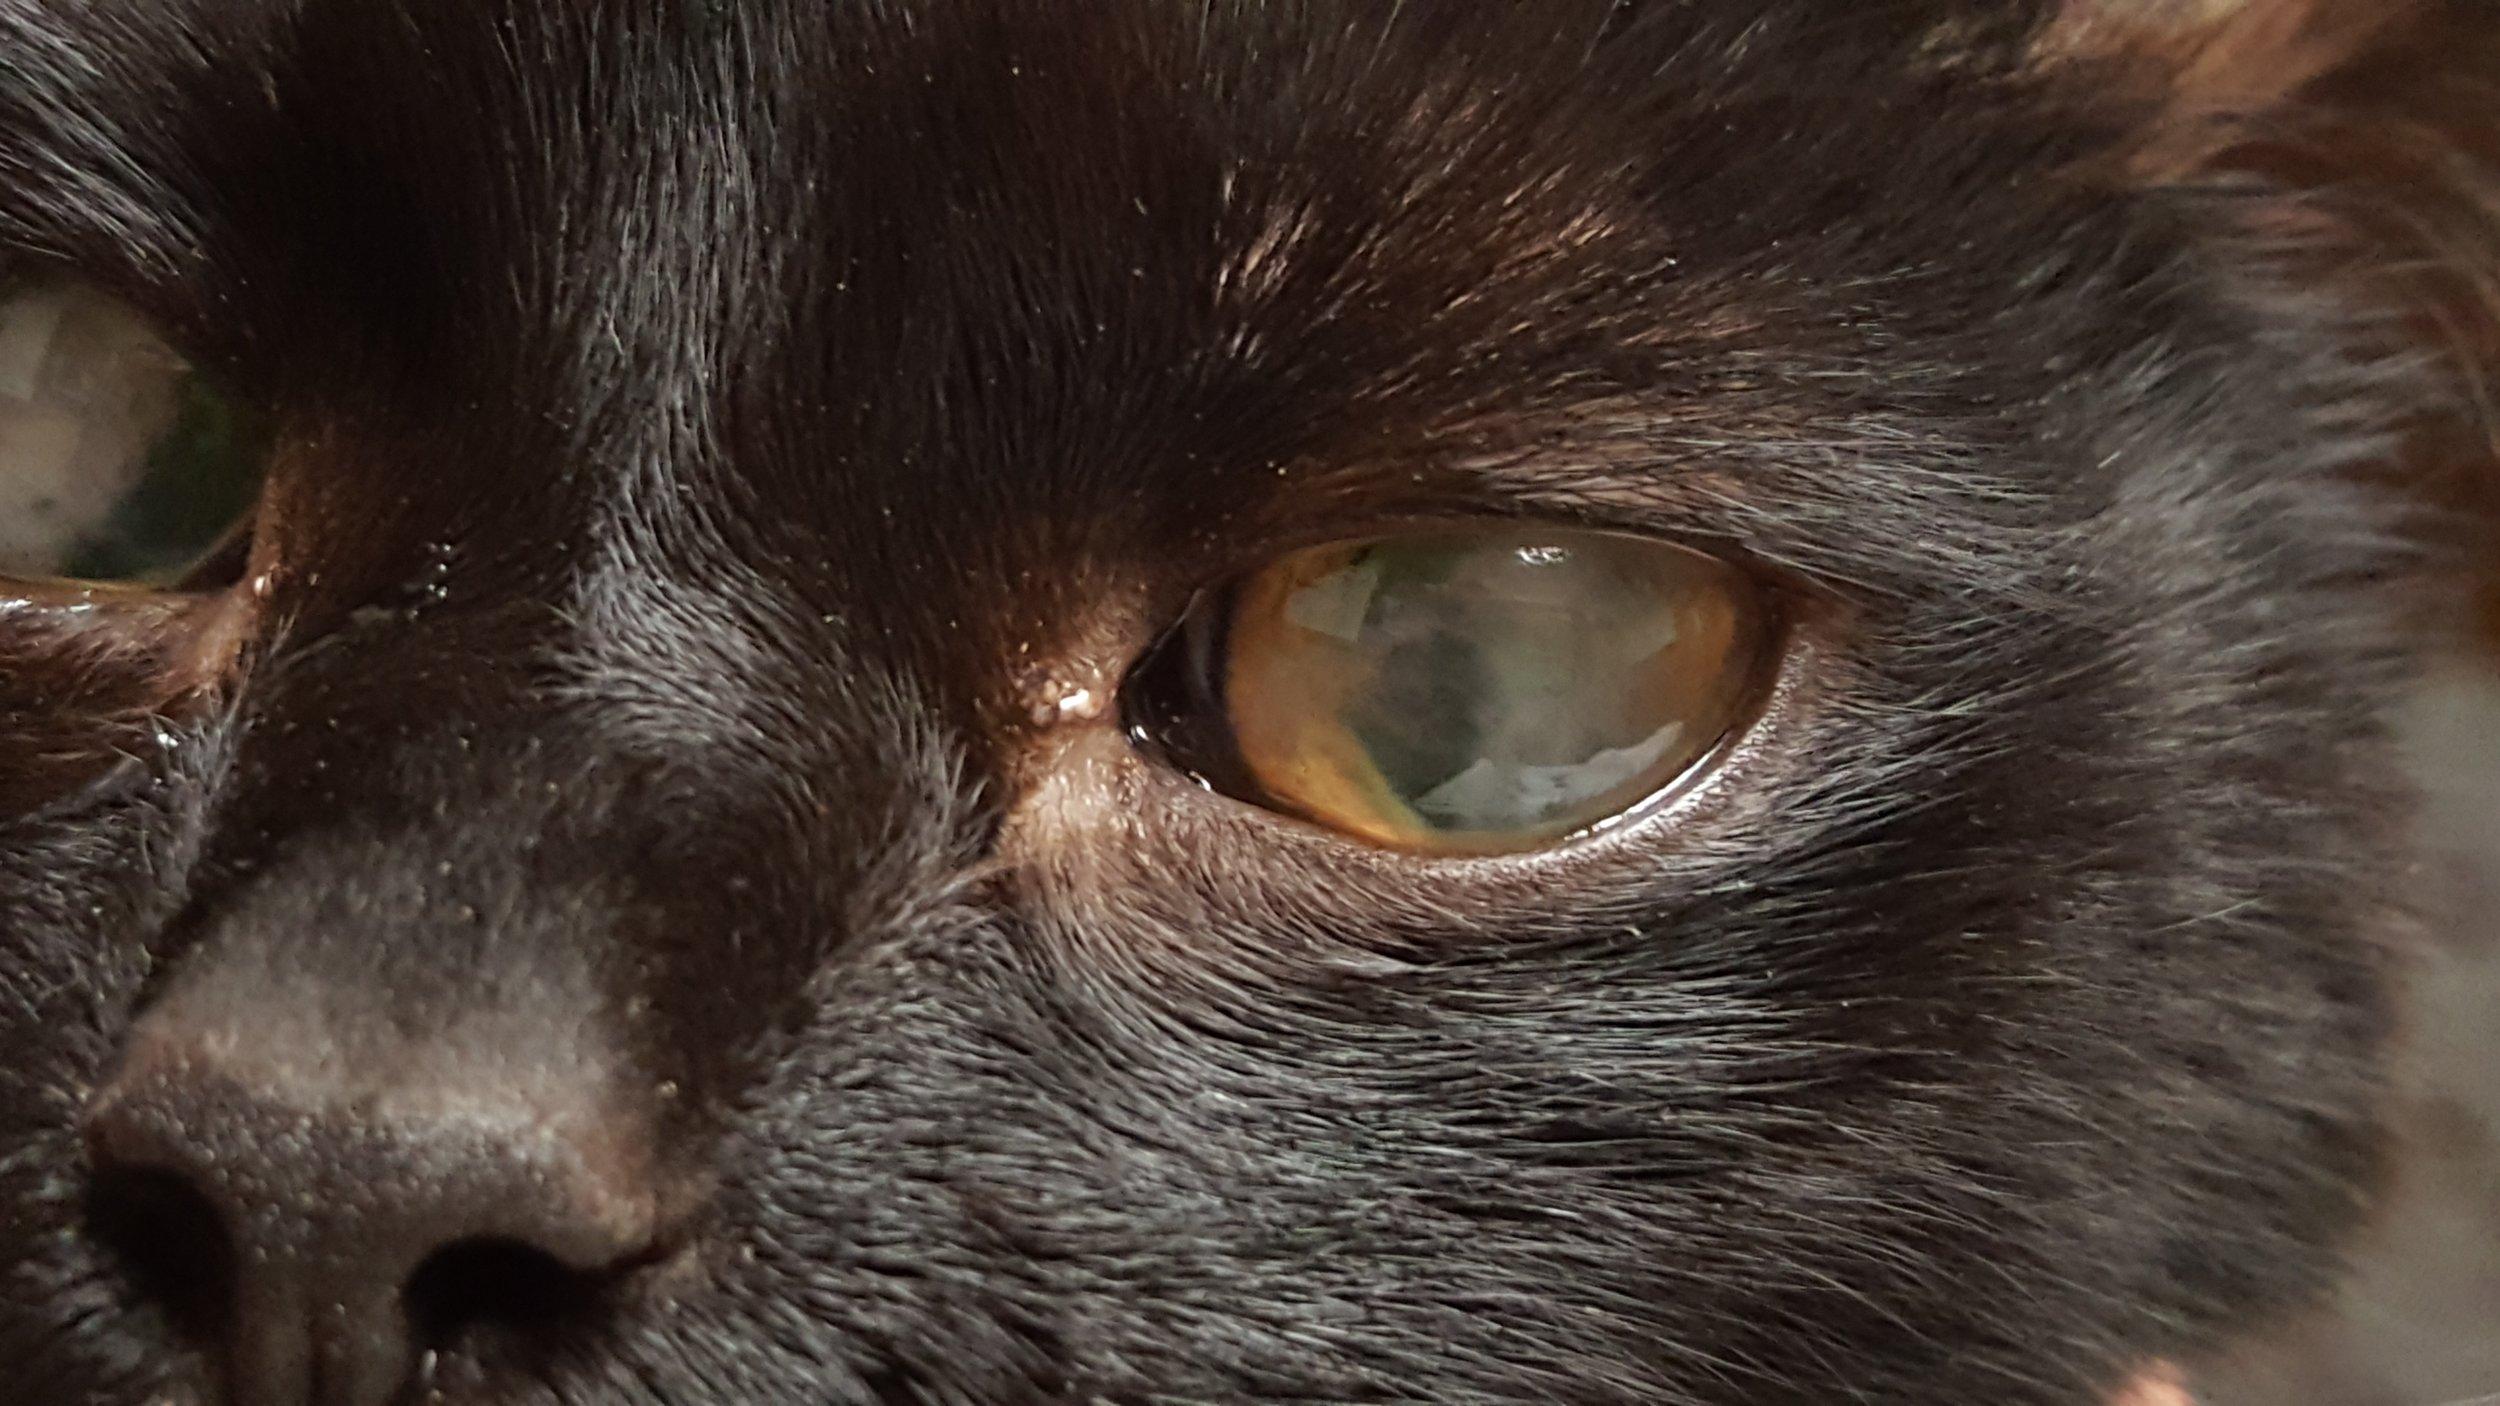 Intraocular fibrin clot on a cat #3